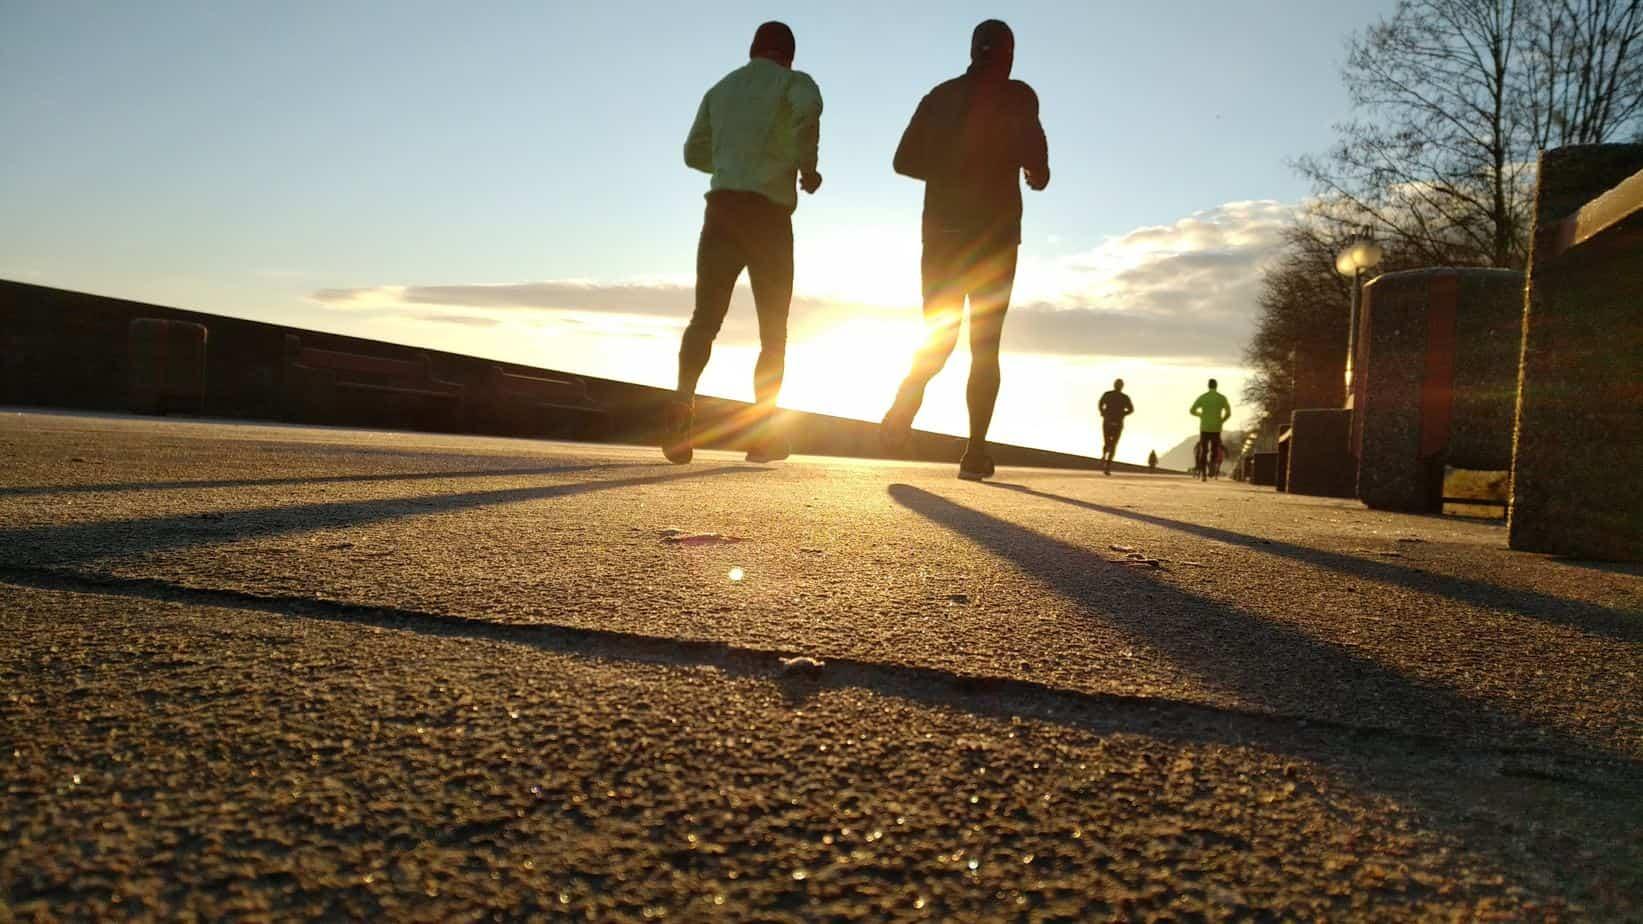 Løpeprogram 10 km under 55 min - treningsprogram - løpetrening.no